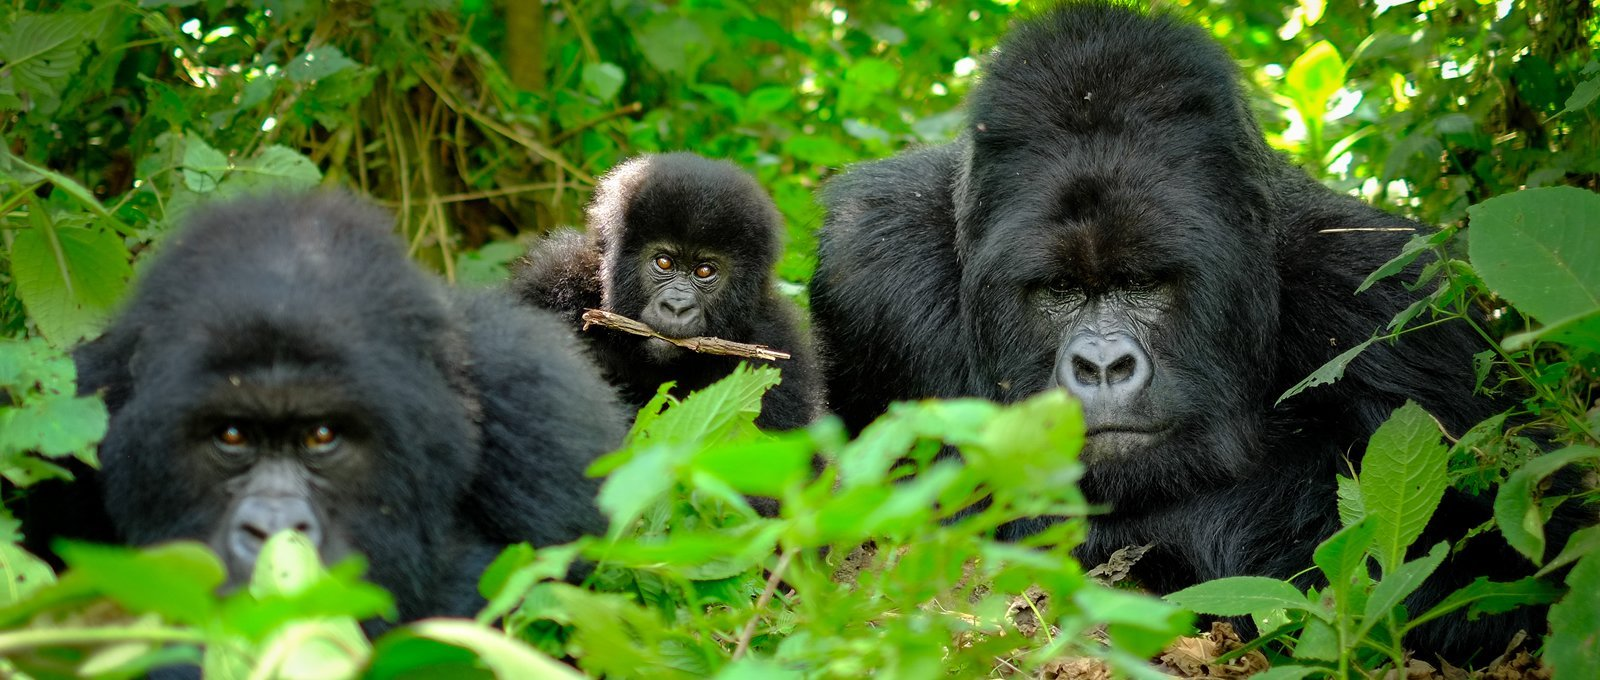 10 Days Wildlife And Gorilla Trekking Group Tour